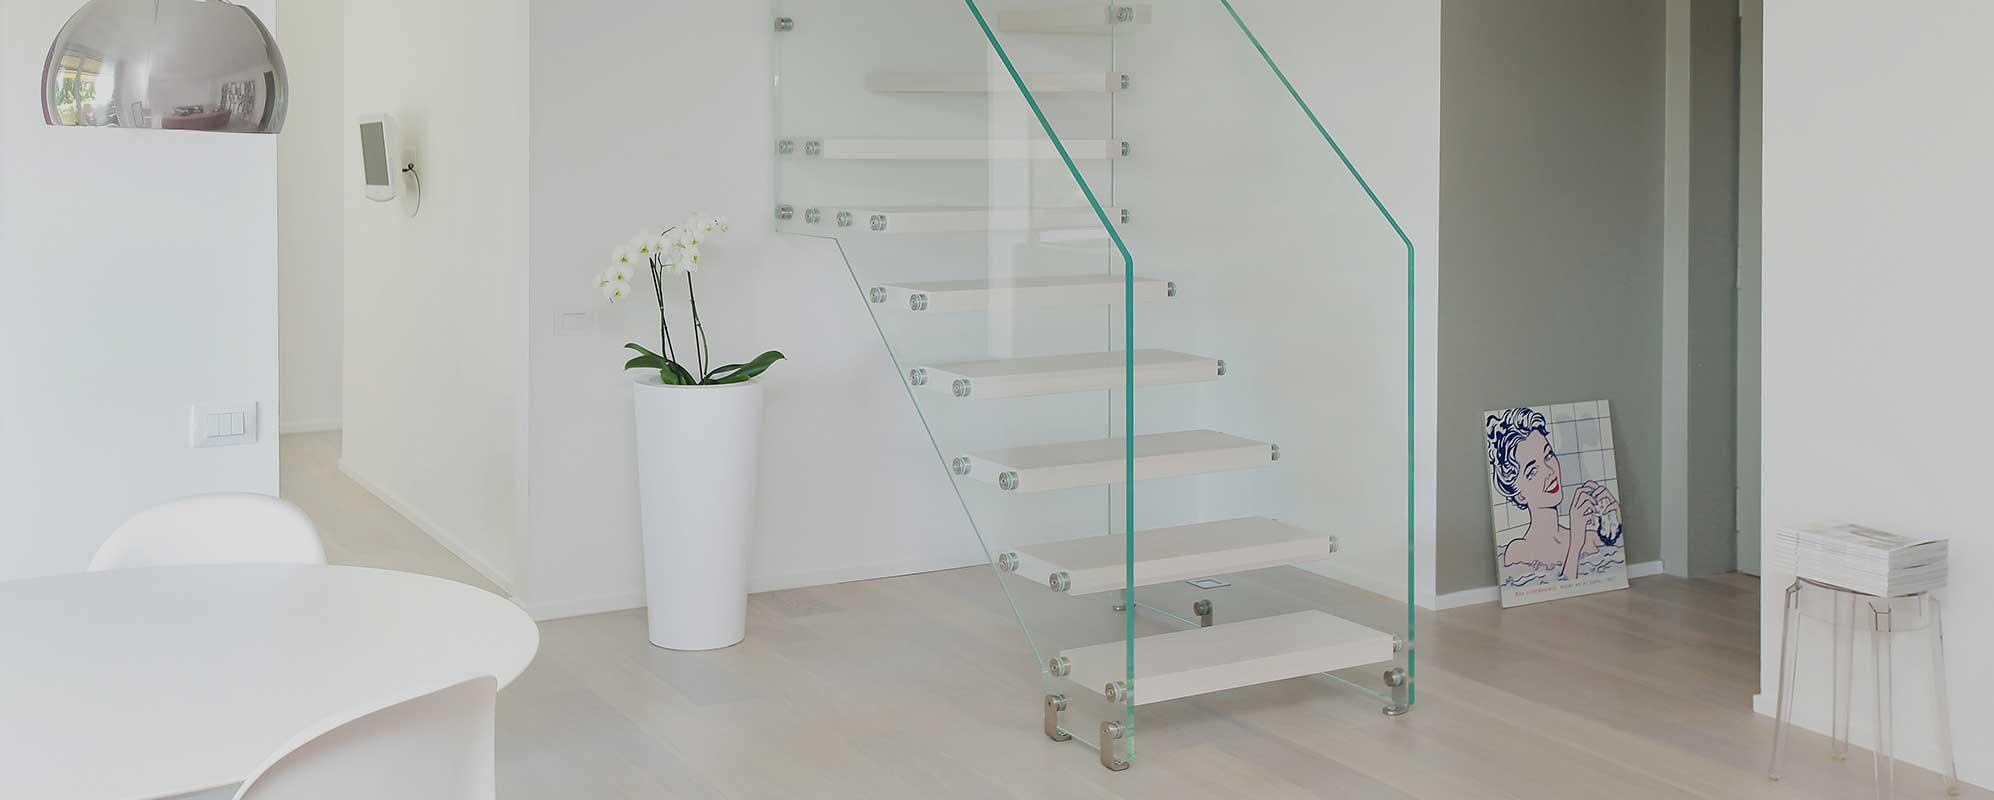 Disegni di scale interne ringhiera in ferro battuto per - Disegni di scale interne ...